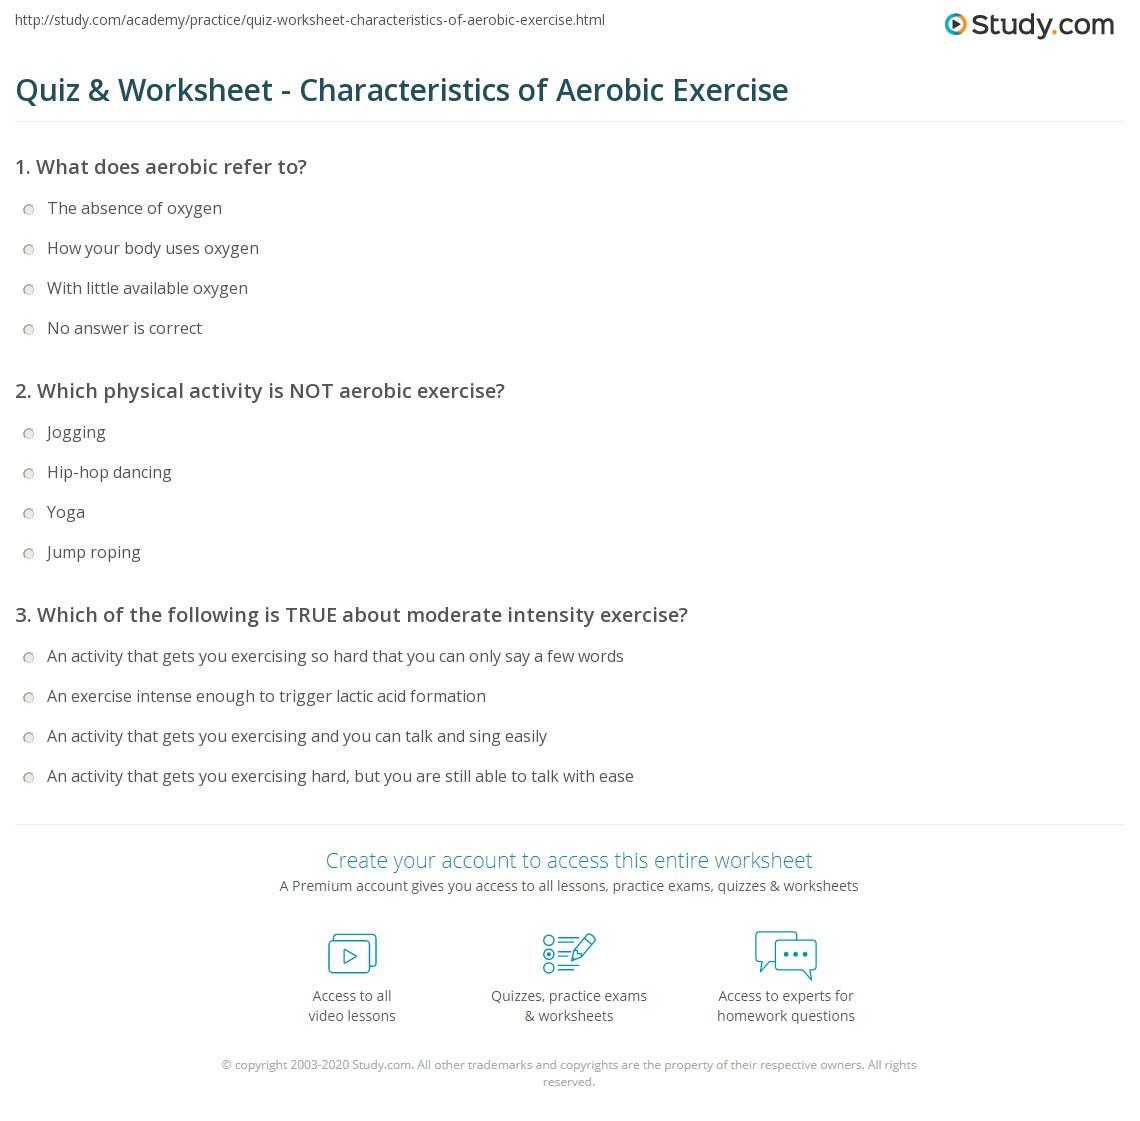 Quiz W Ksheet Ch R Cteristics Of Erobic Exercise Study